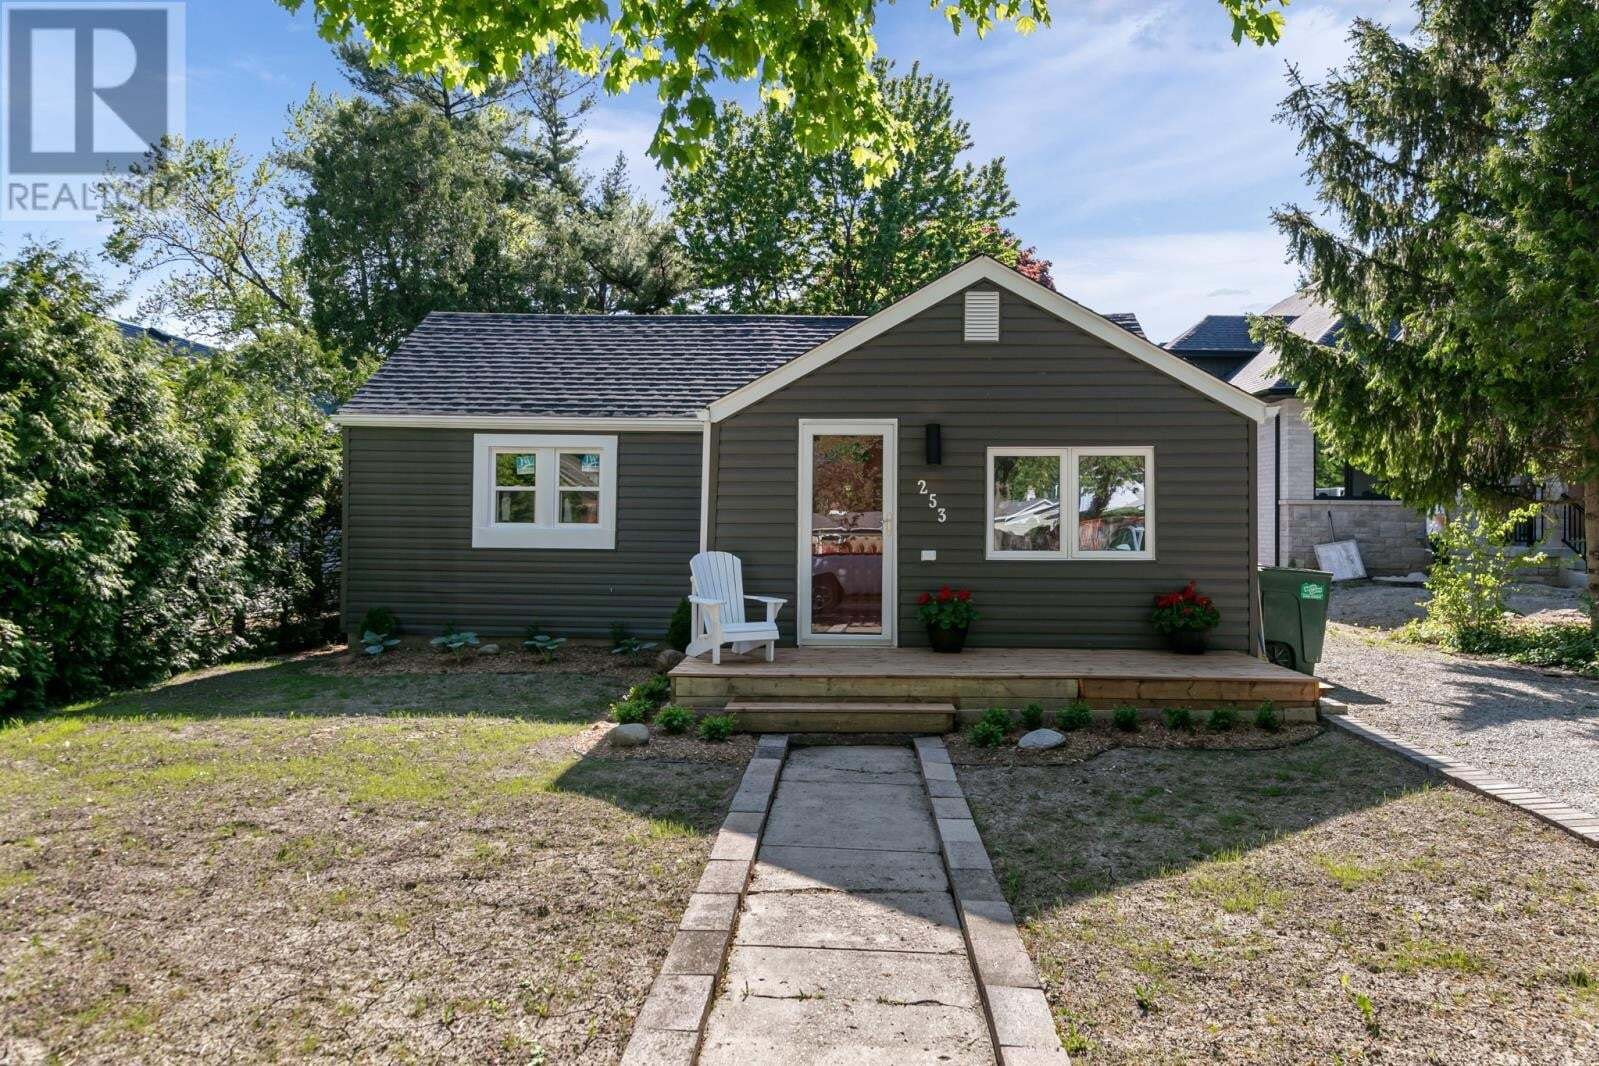 House for sale at 253 Lacasse  Tecumseh Ontario - MLS: 20005816